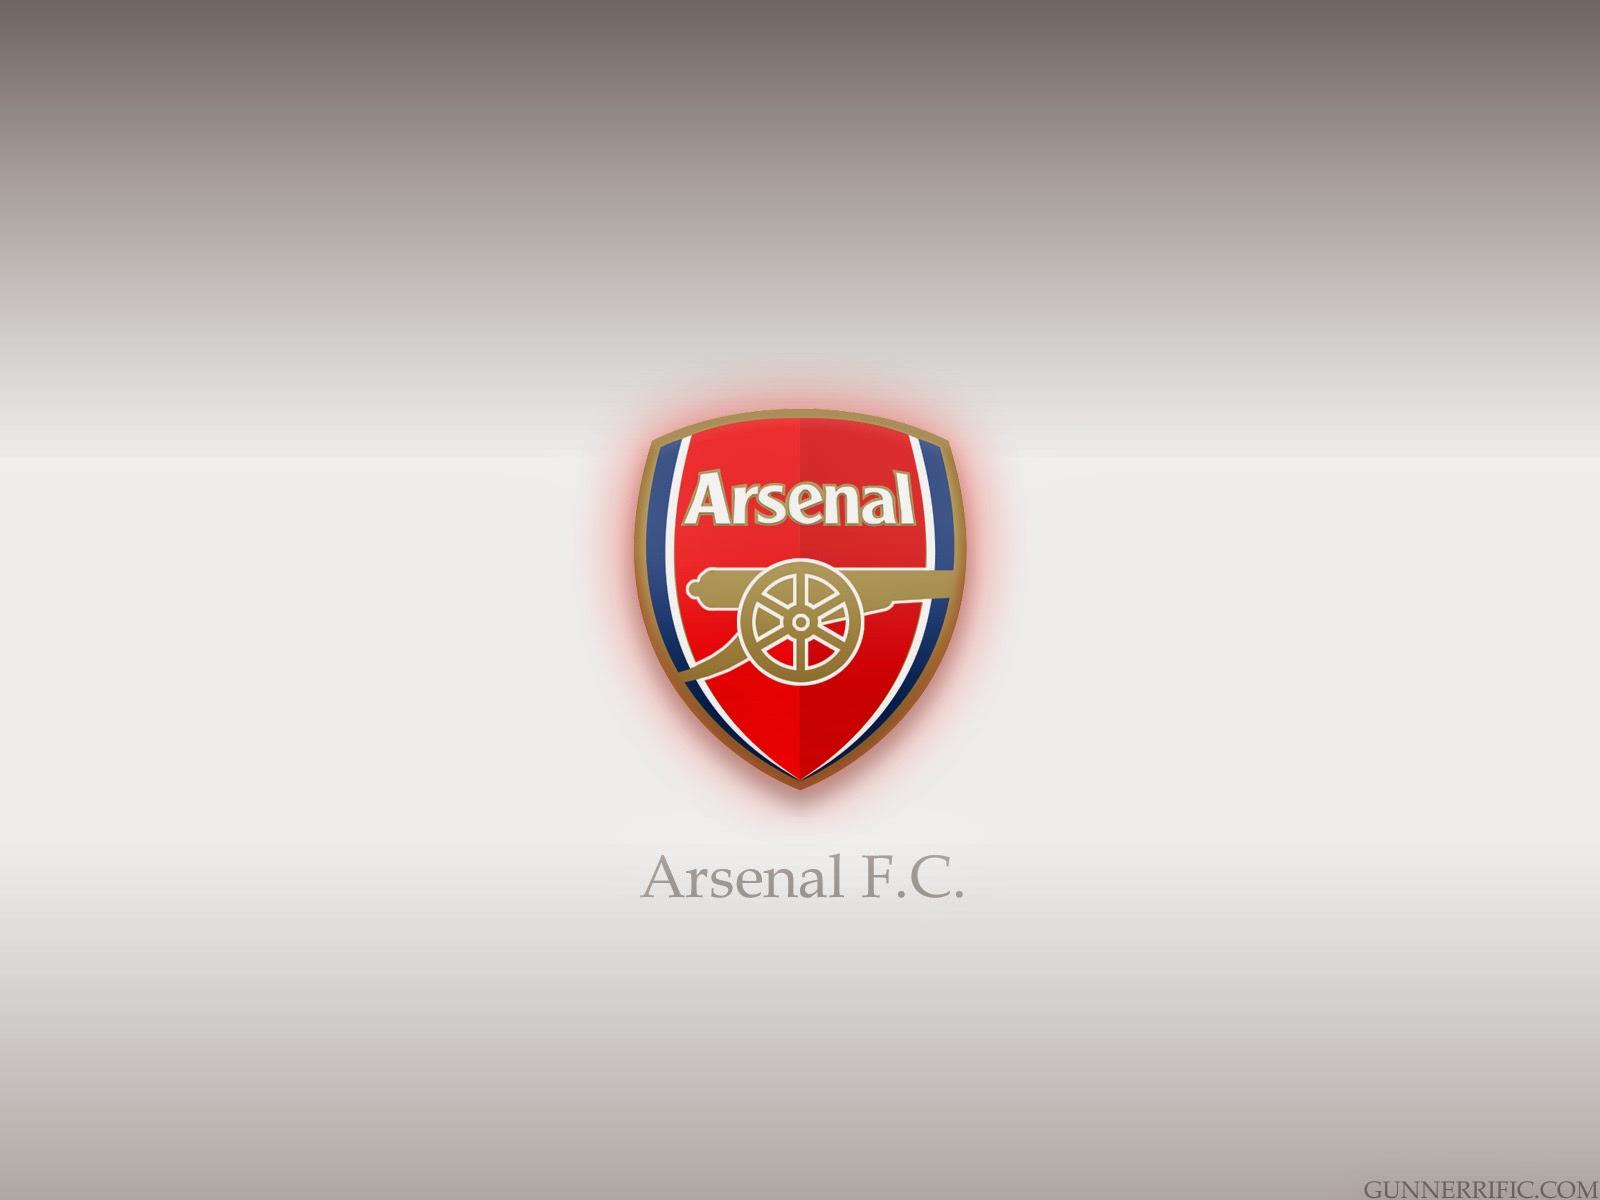 Wallpaper iphone arsenal -  Arsenal Football Club Wallpaper